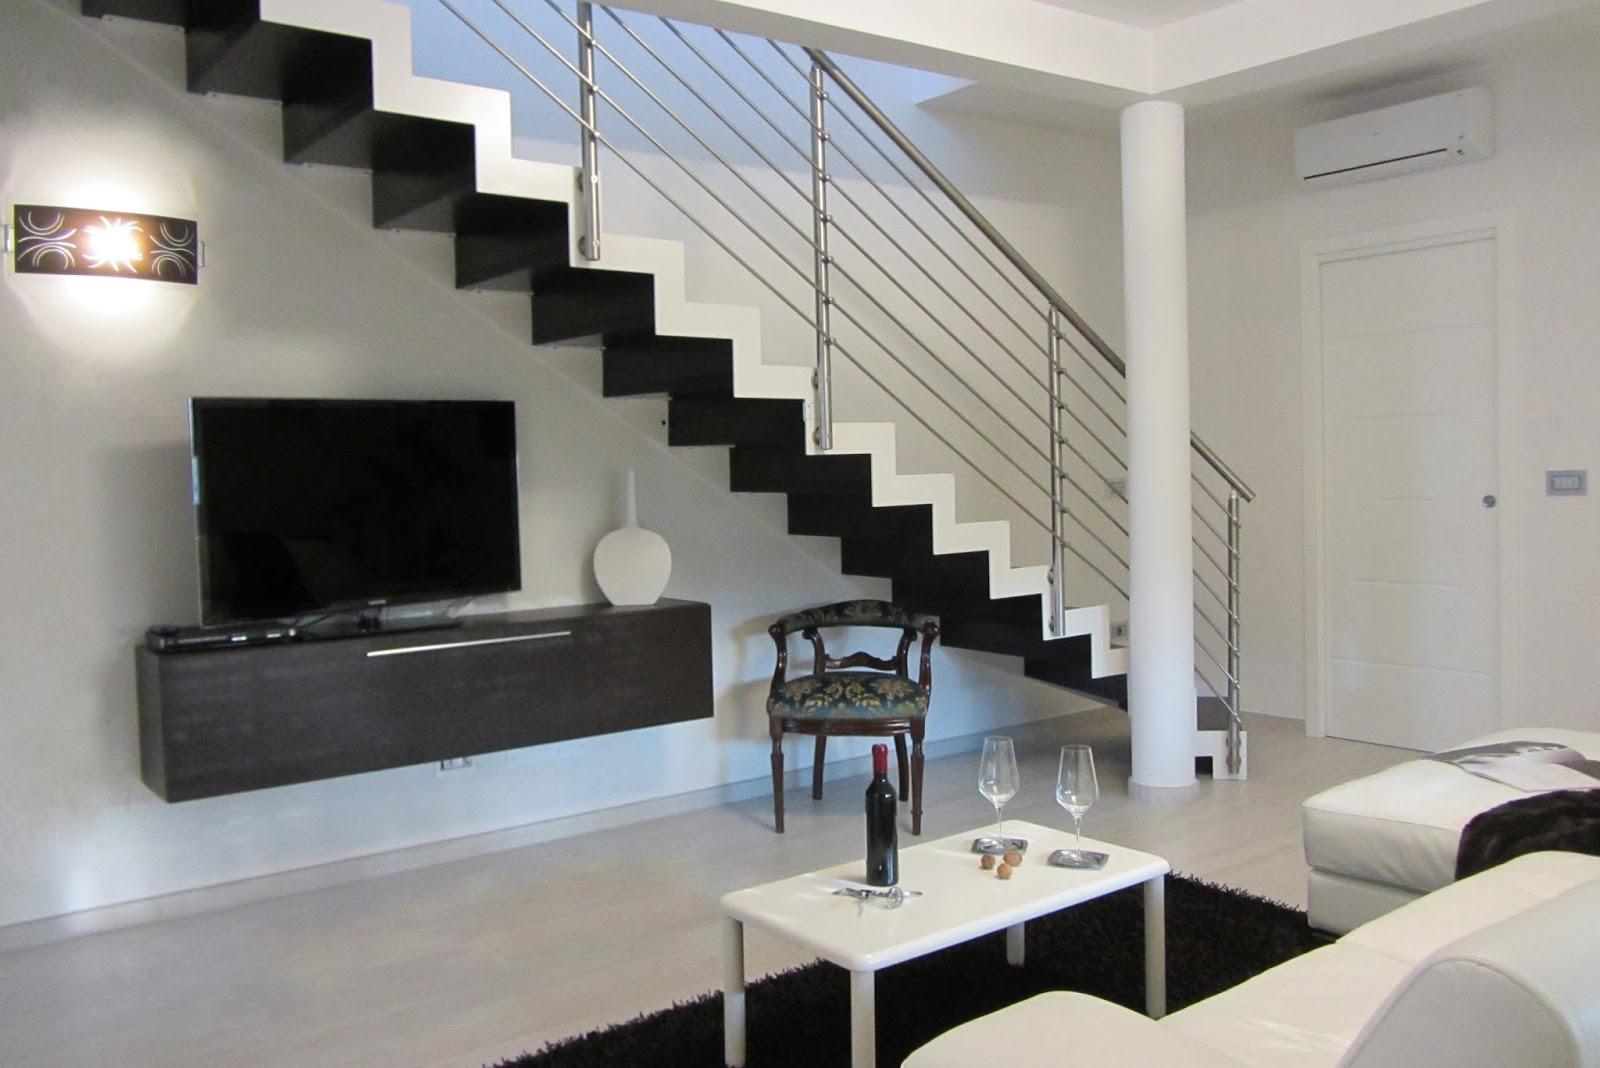 Sala con escalera salas con estilo for Diseno de interiores sala de estar